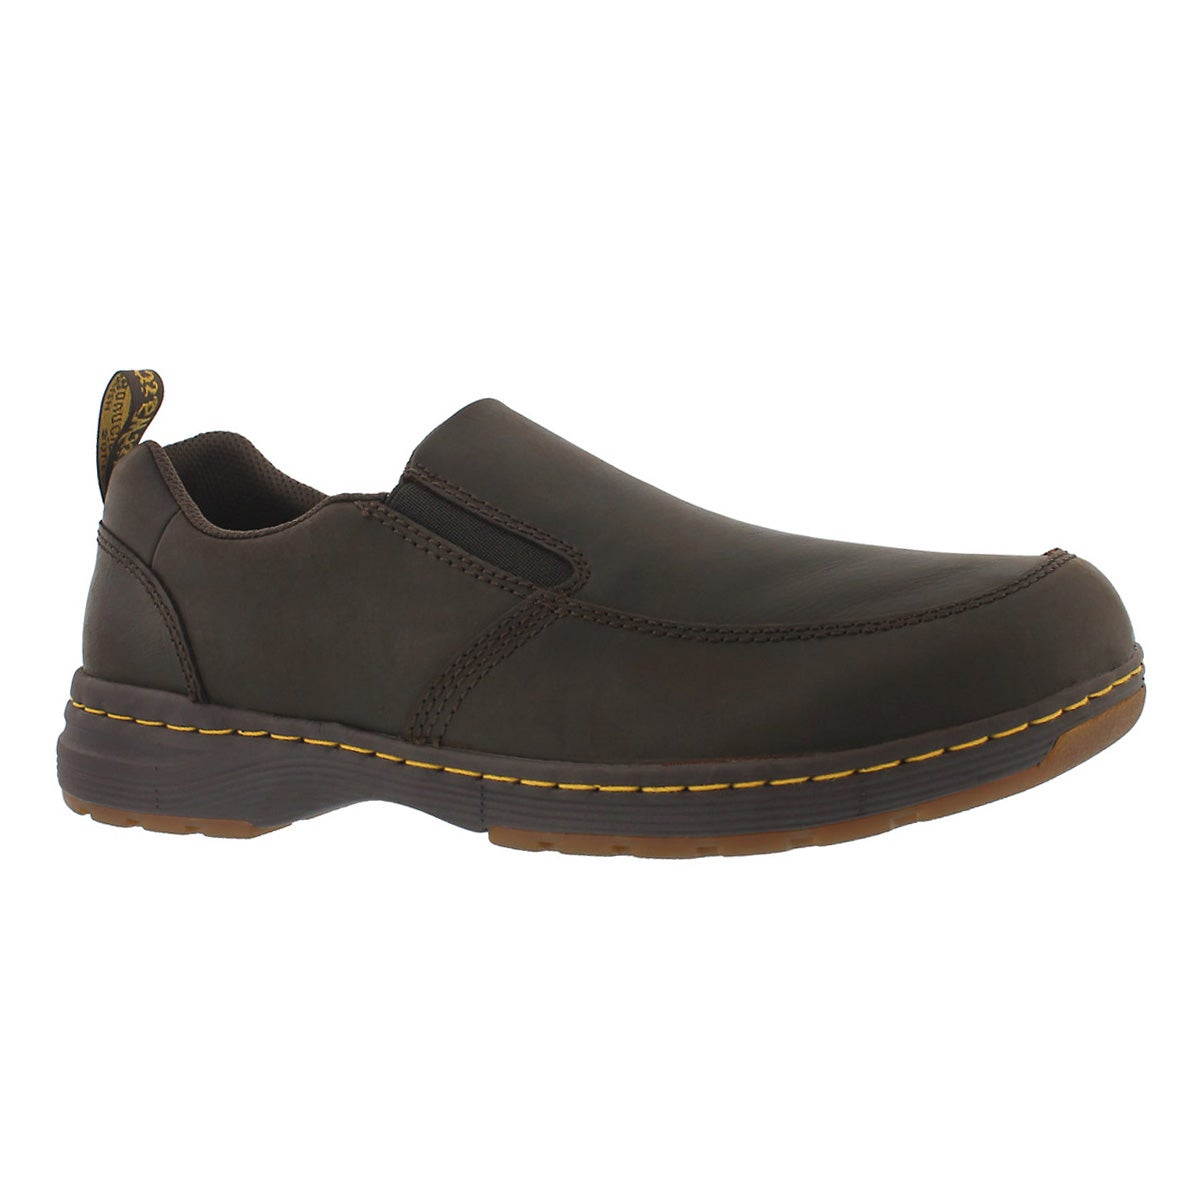 Men's BRENNAN brown slip on casual shoe